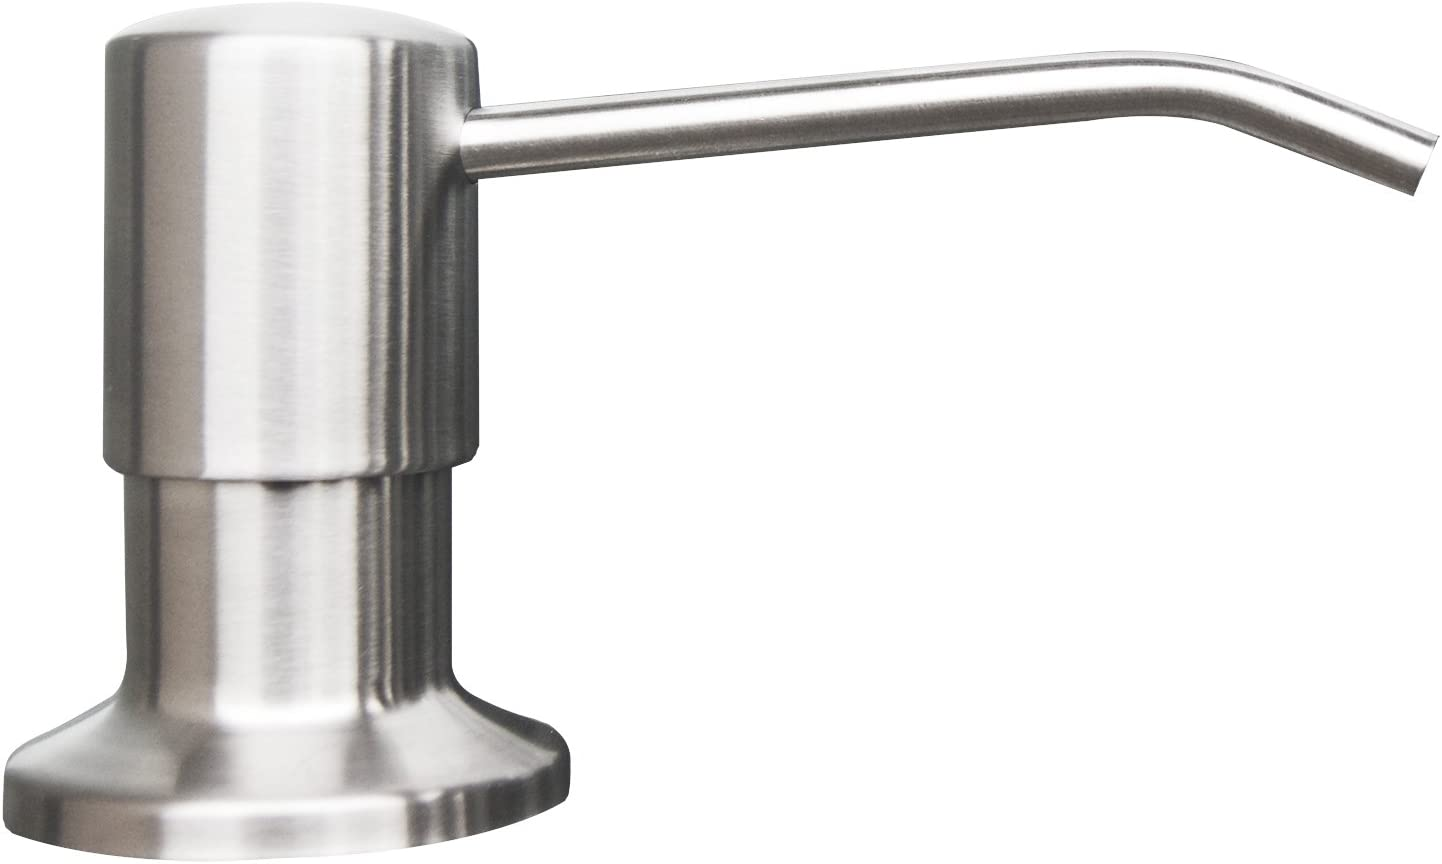 Korlon Stainless Steel Built in Pump Kitchen Sink Dish Soap Dispenser -  Large Capacity 17 OZ Bottle - 3.15 Inch Threaded Tube for Thick Deck ...